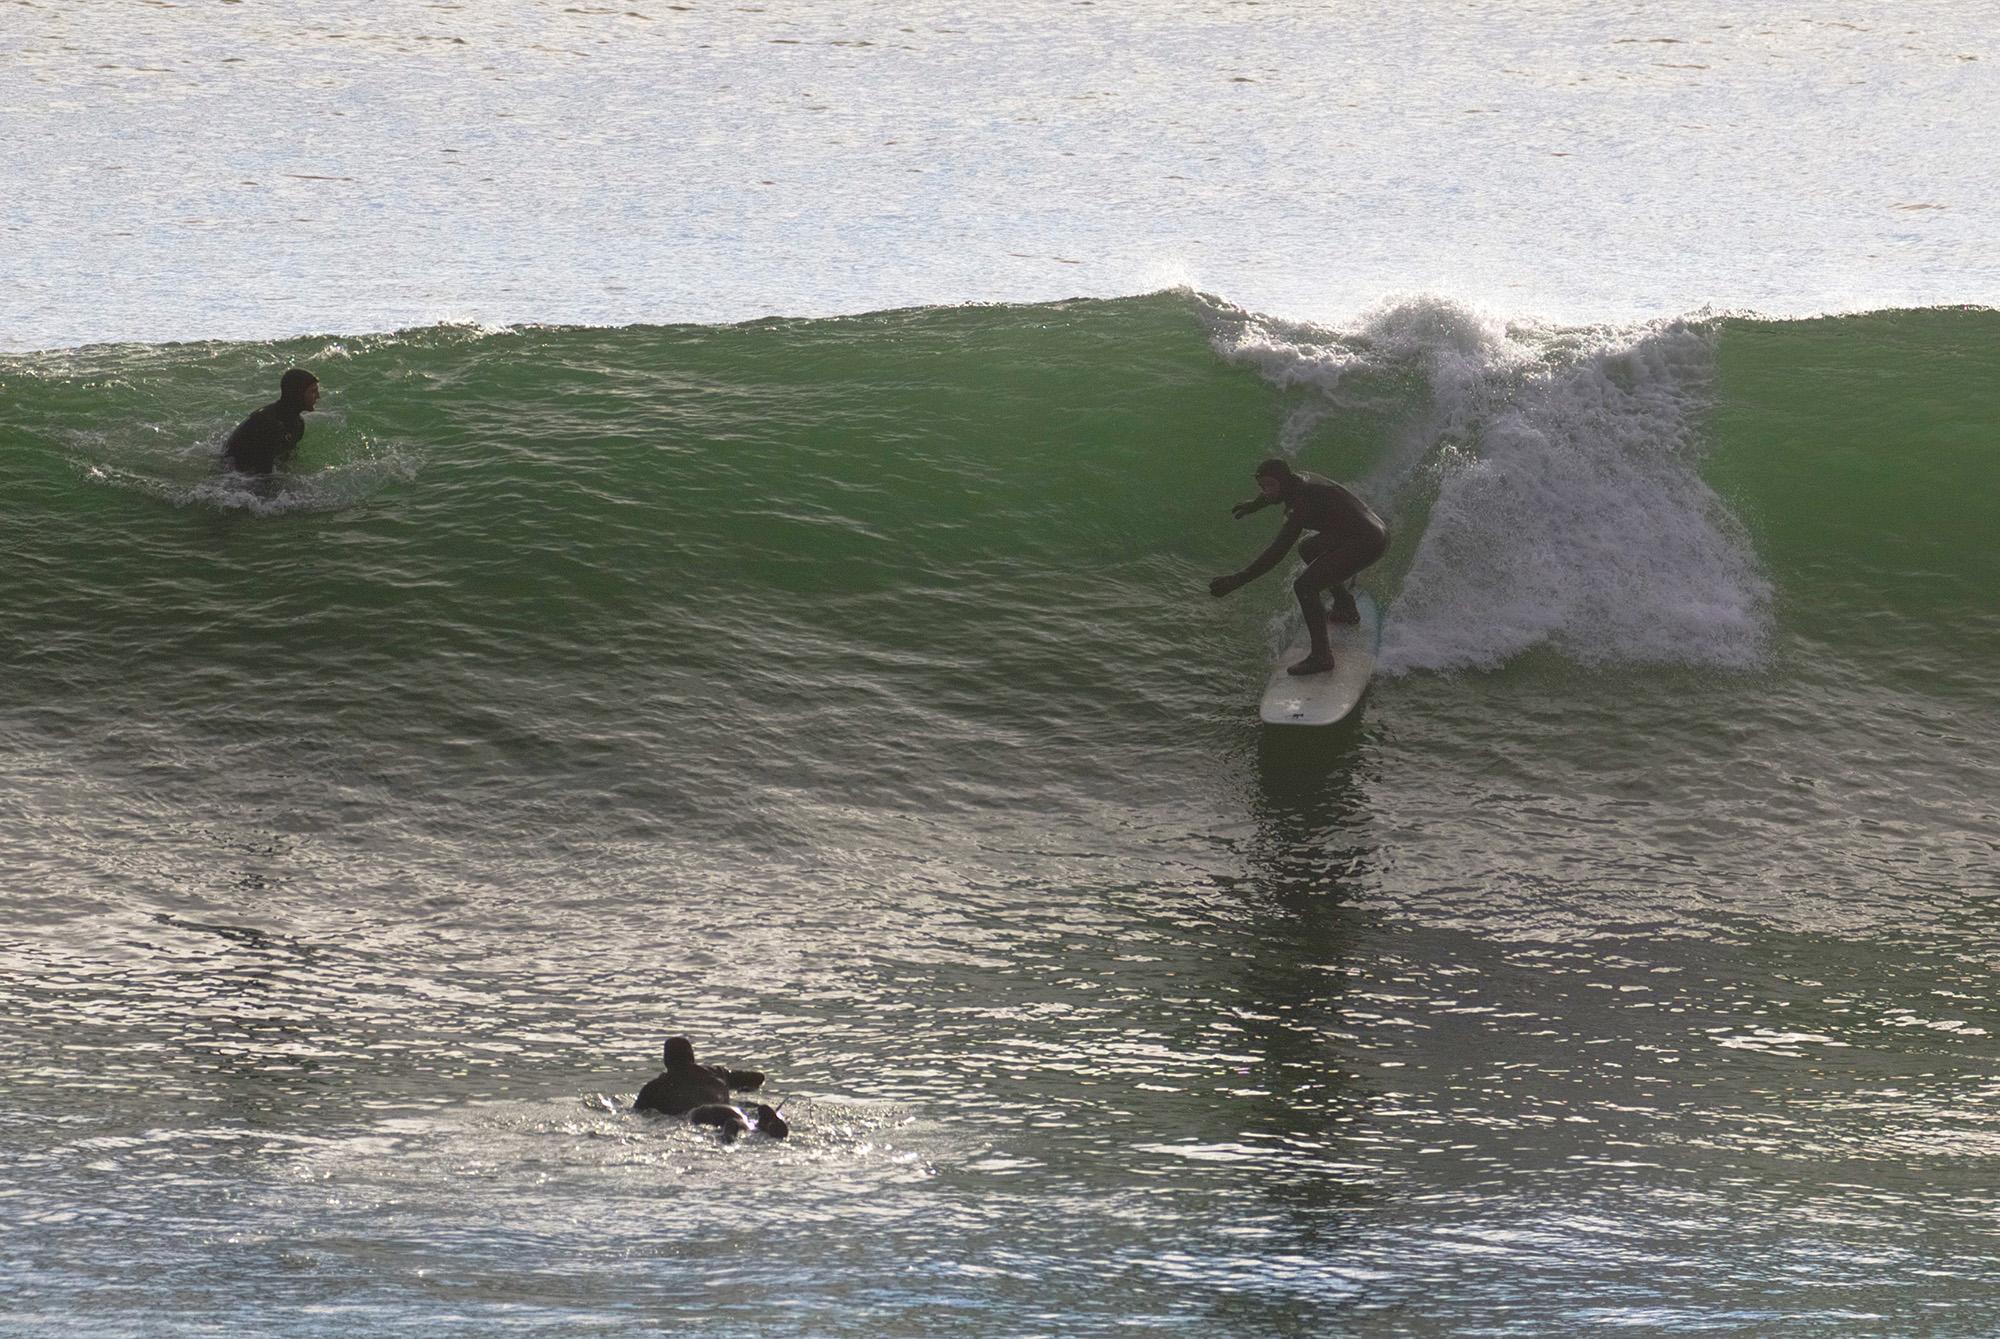 1-19-17 MTK Surfer 9.jpg